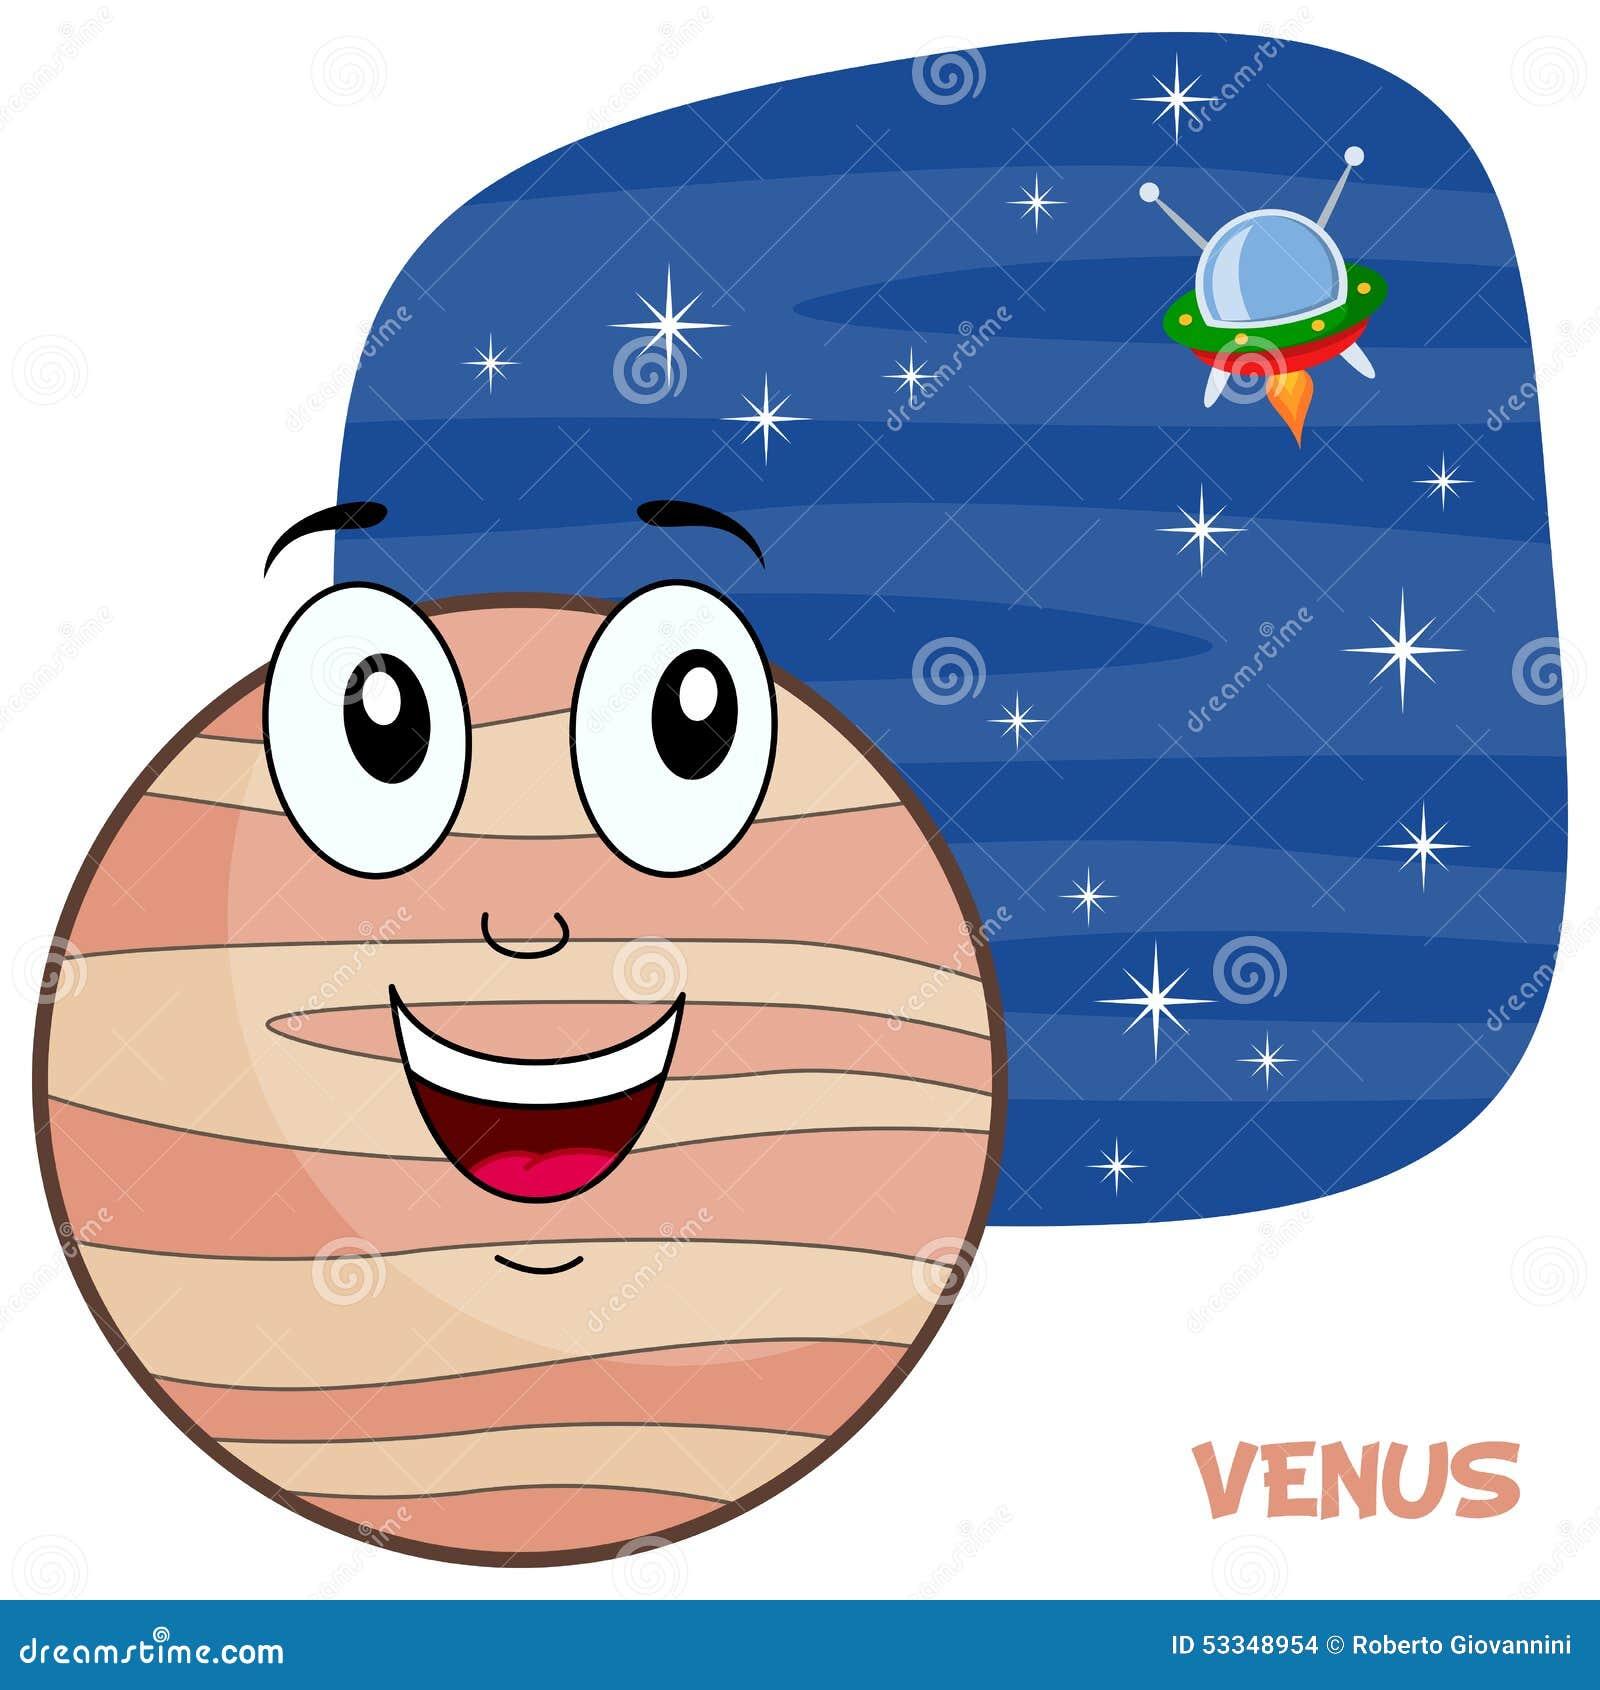 Cartoon Venus Planet Character